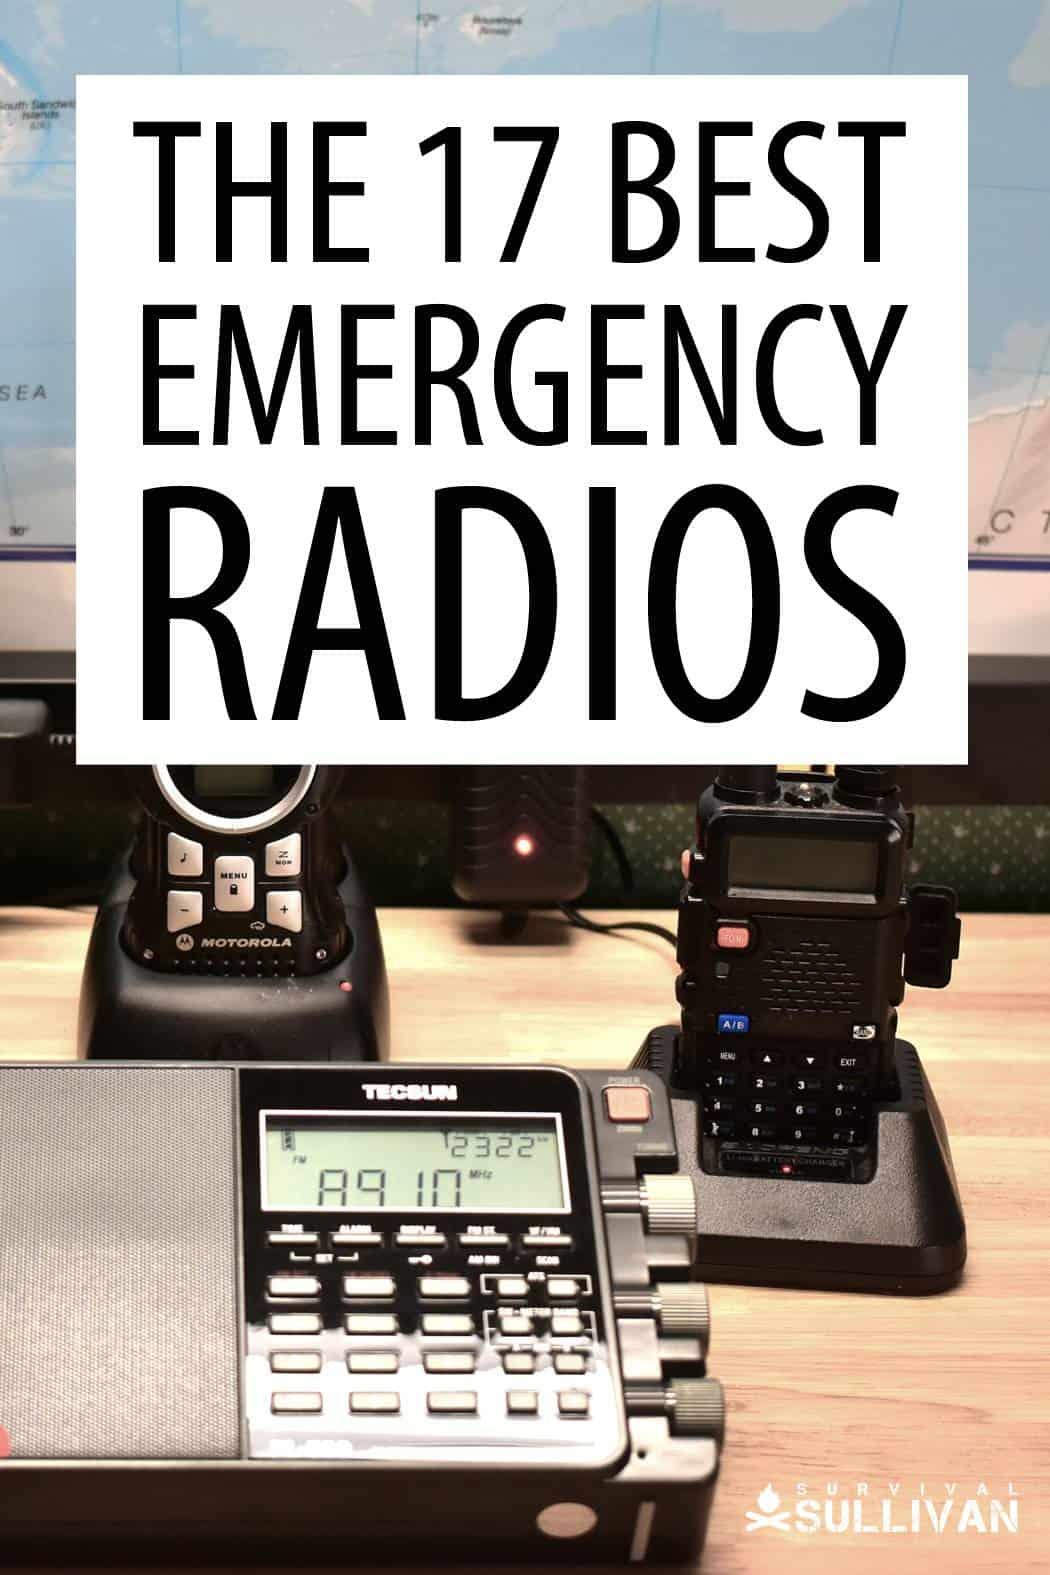 best emergency radios Pinterest image